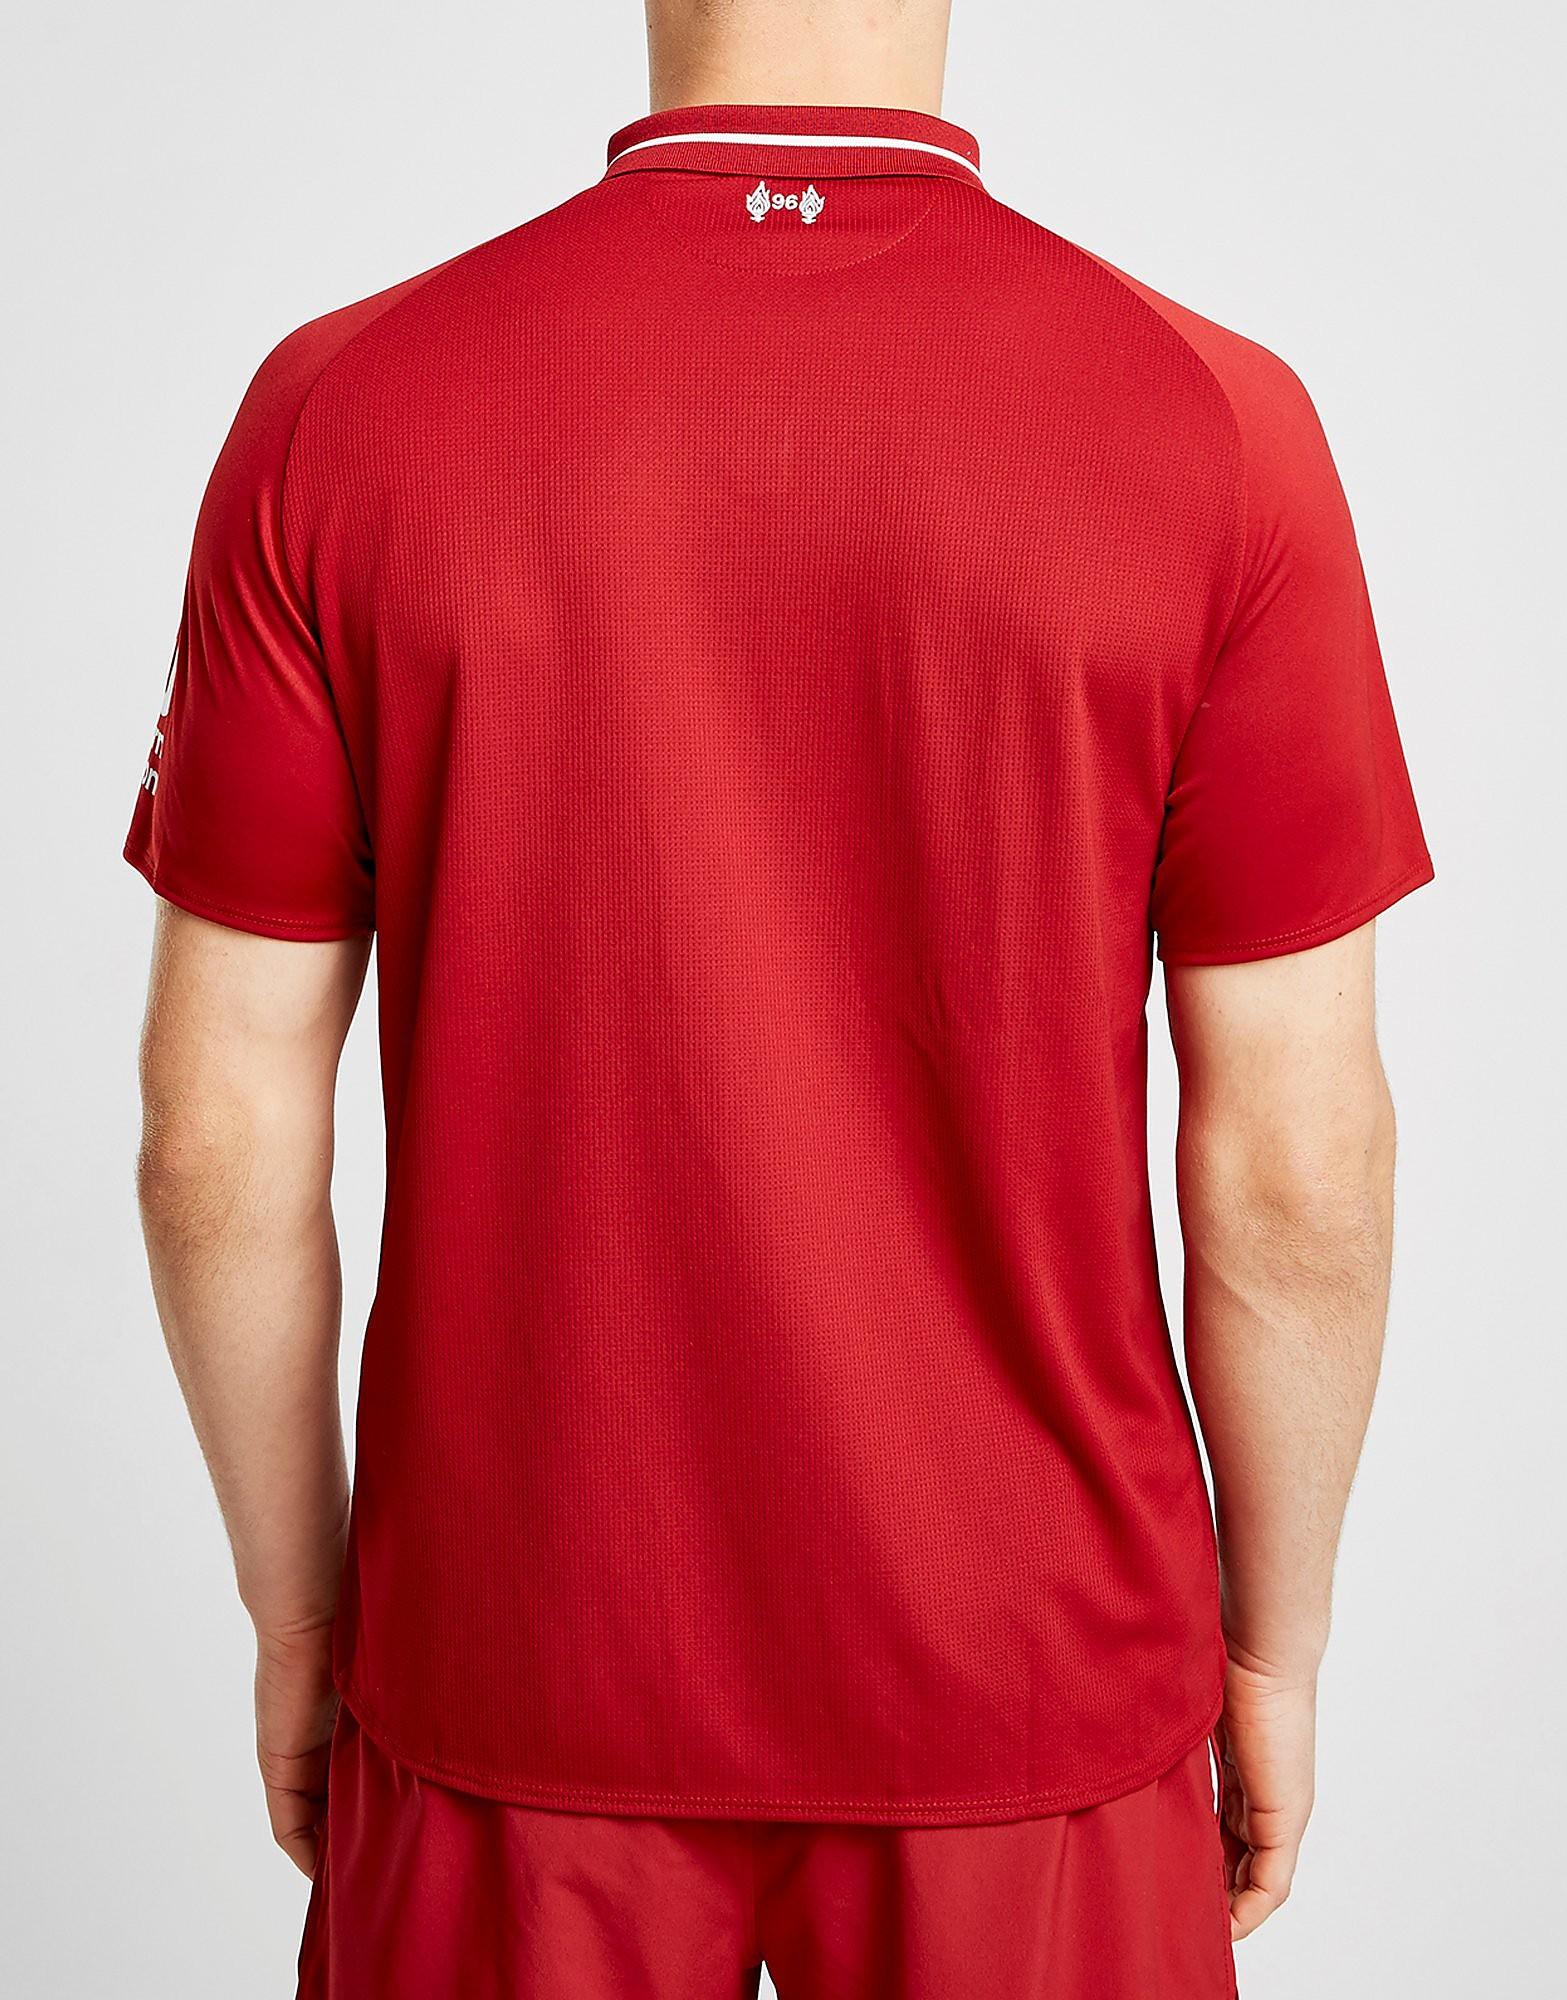 New Balance Liverpool FC 2018 Home Shirt